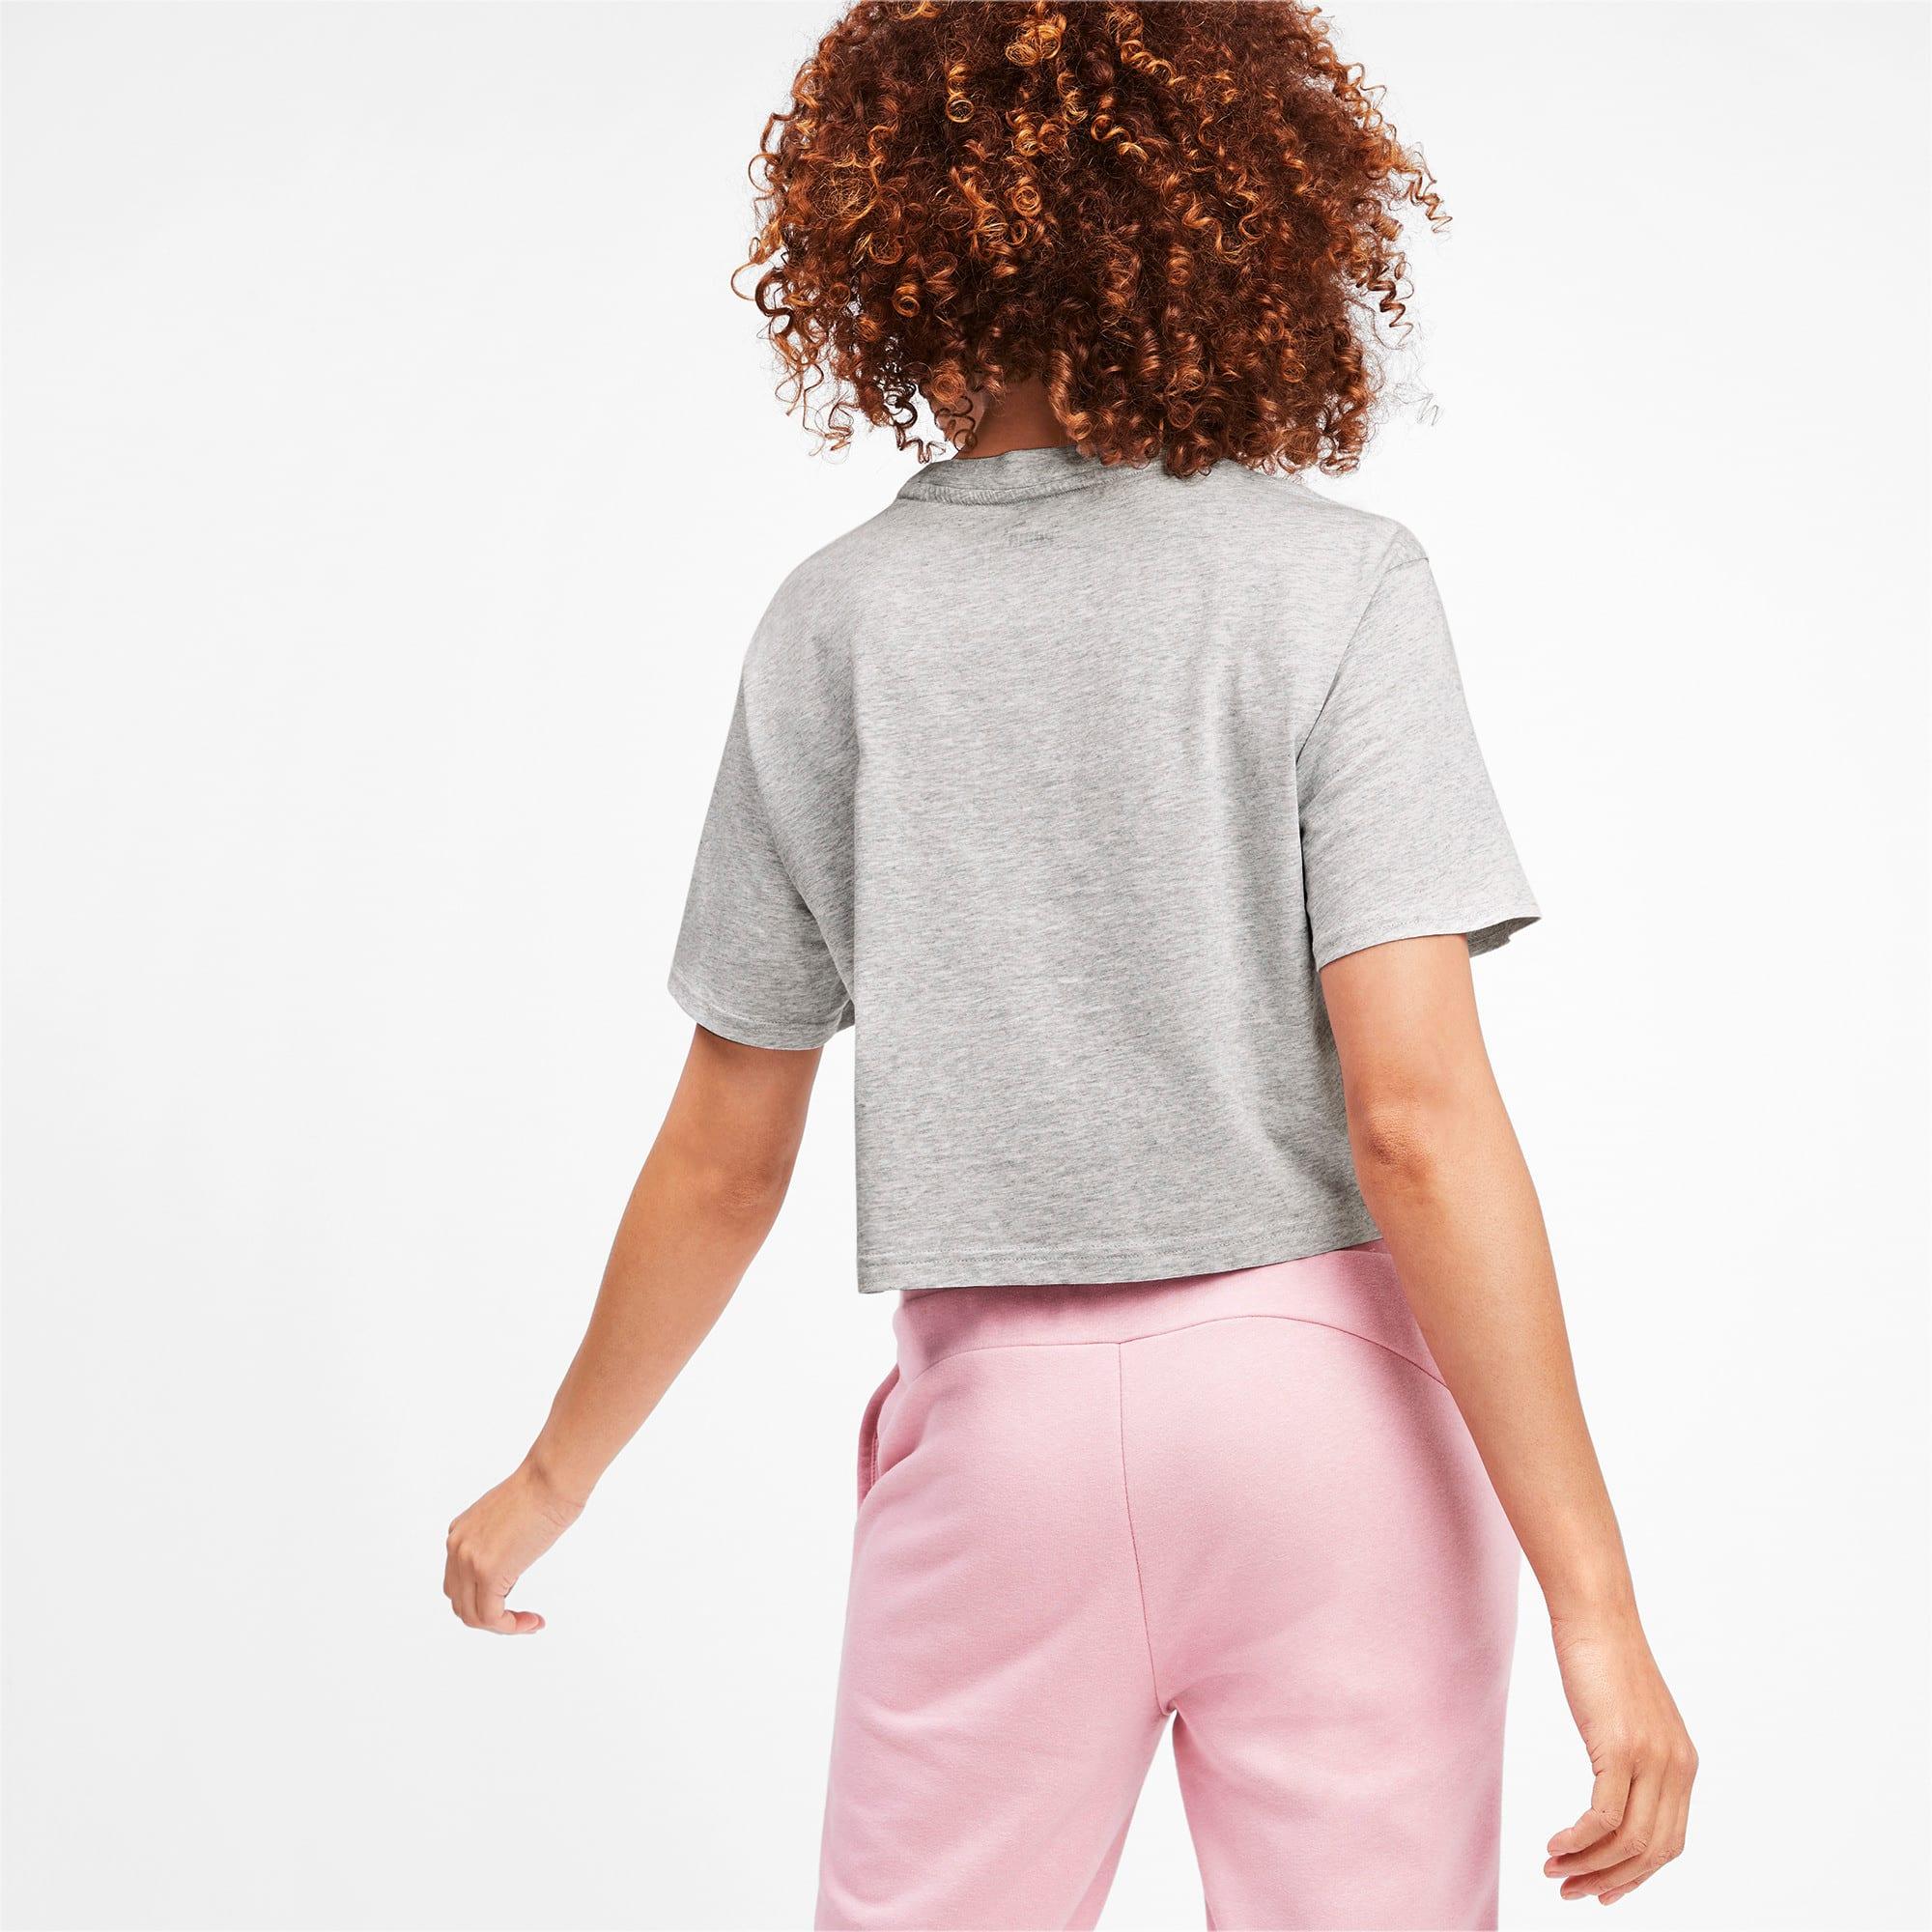 Miniatura 3 de Camiseta corta Amplified para mujer, Light Gray Heather, mediano